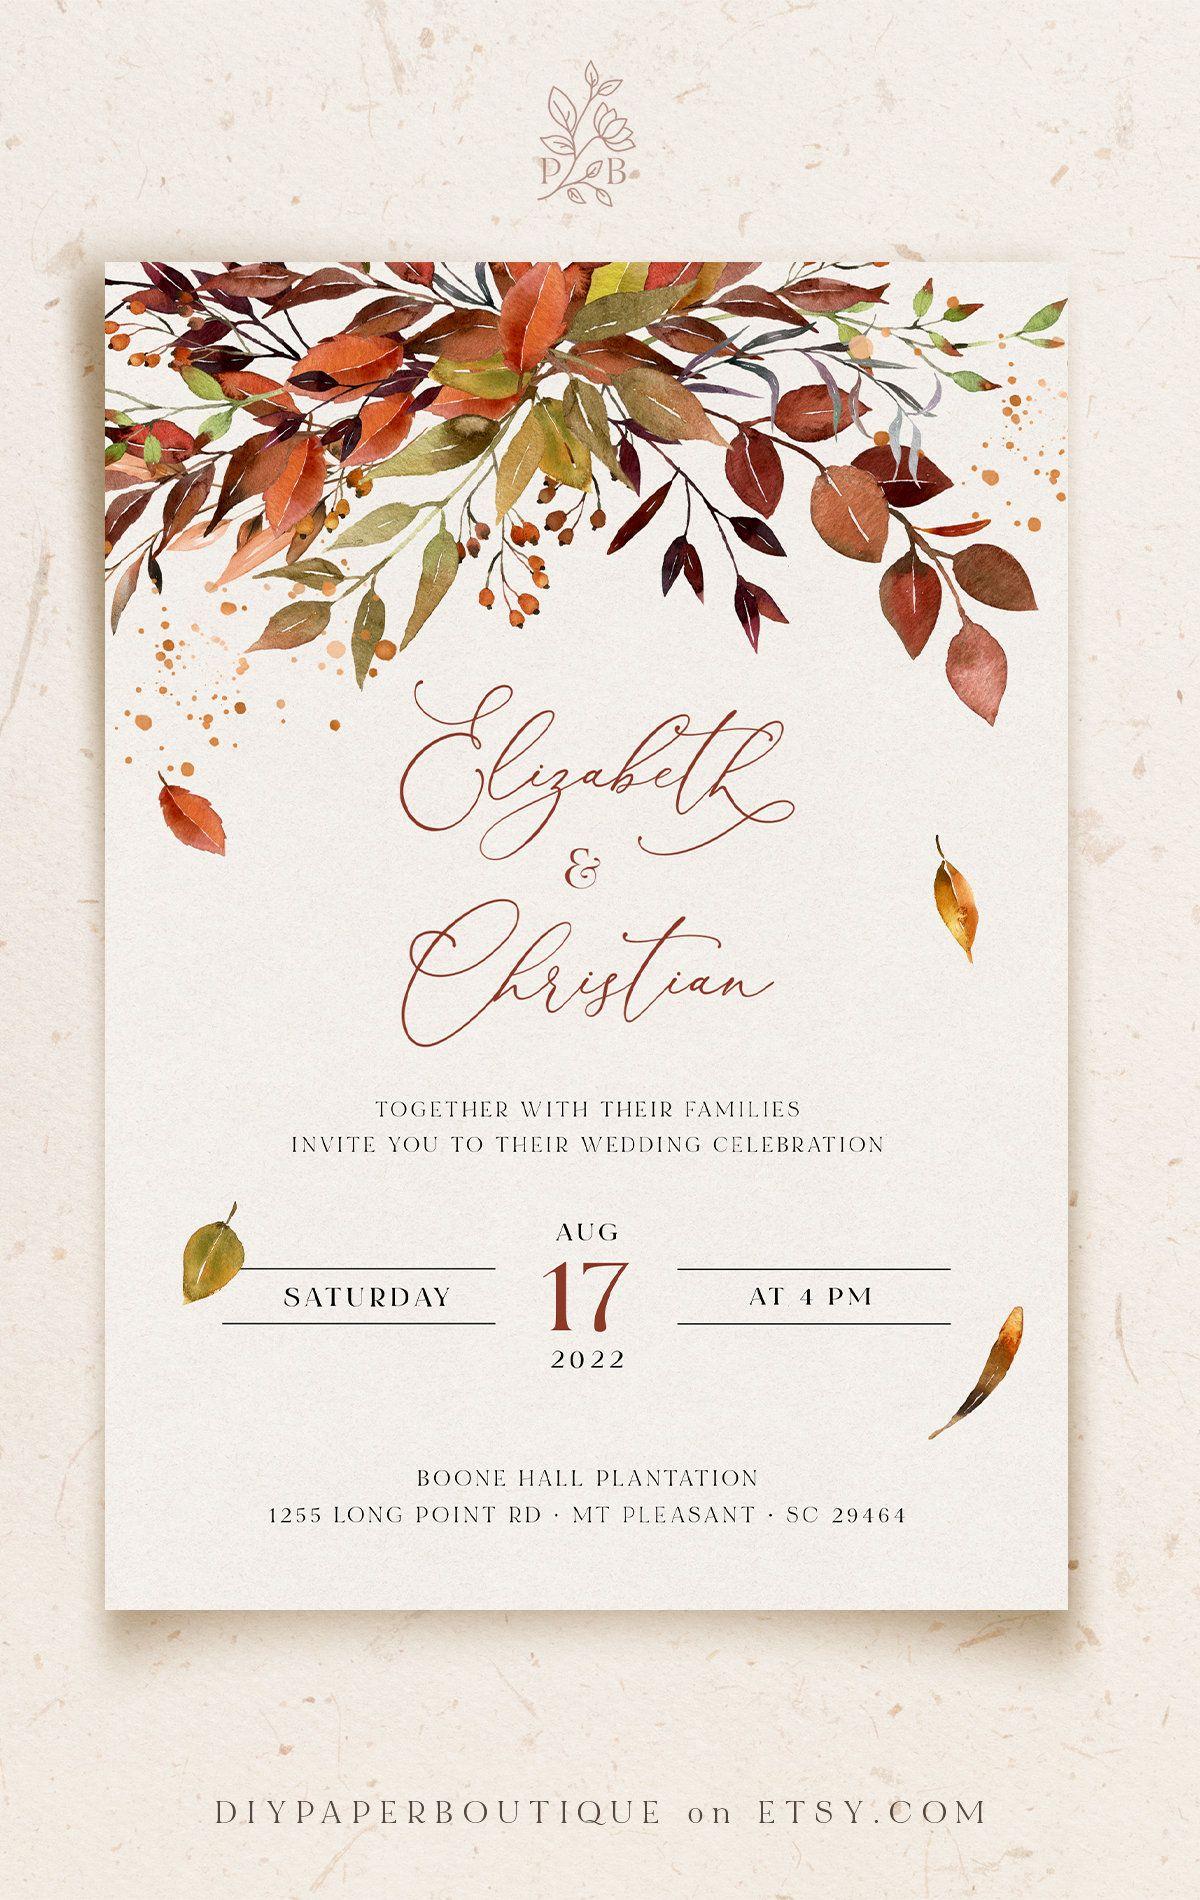 Photo of SIENNA – Bohemian Rustic Fall Wedding Invitation Template, Fall Leaves and Greenery, Burnt Orange Invites, Boho Fall Invitations, DIY